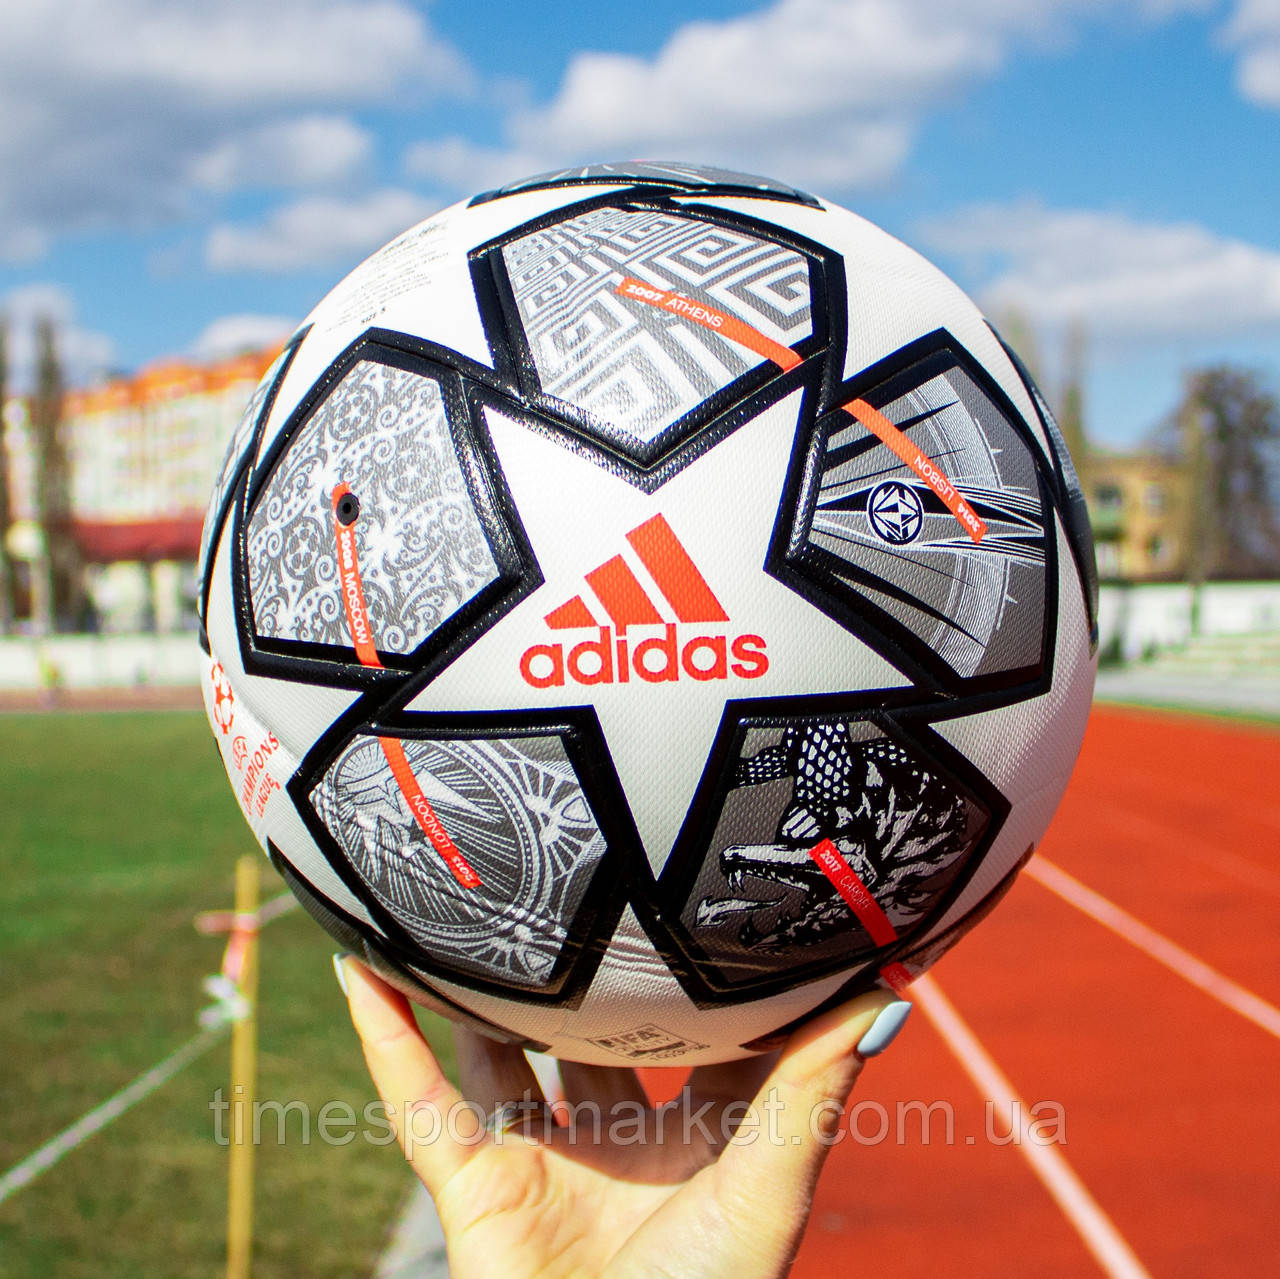 Футбольный мяч Adidas Finale 21 20th Anniversary UCL League